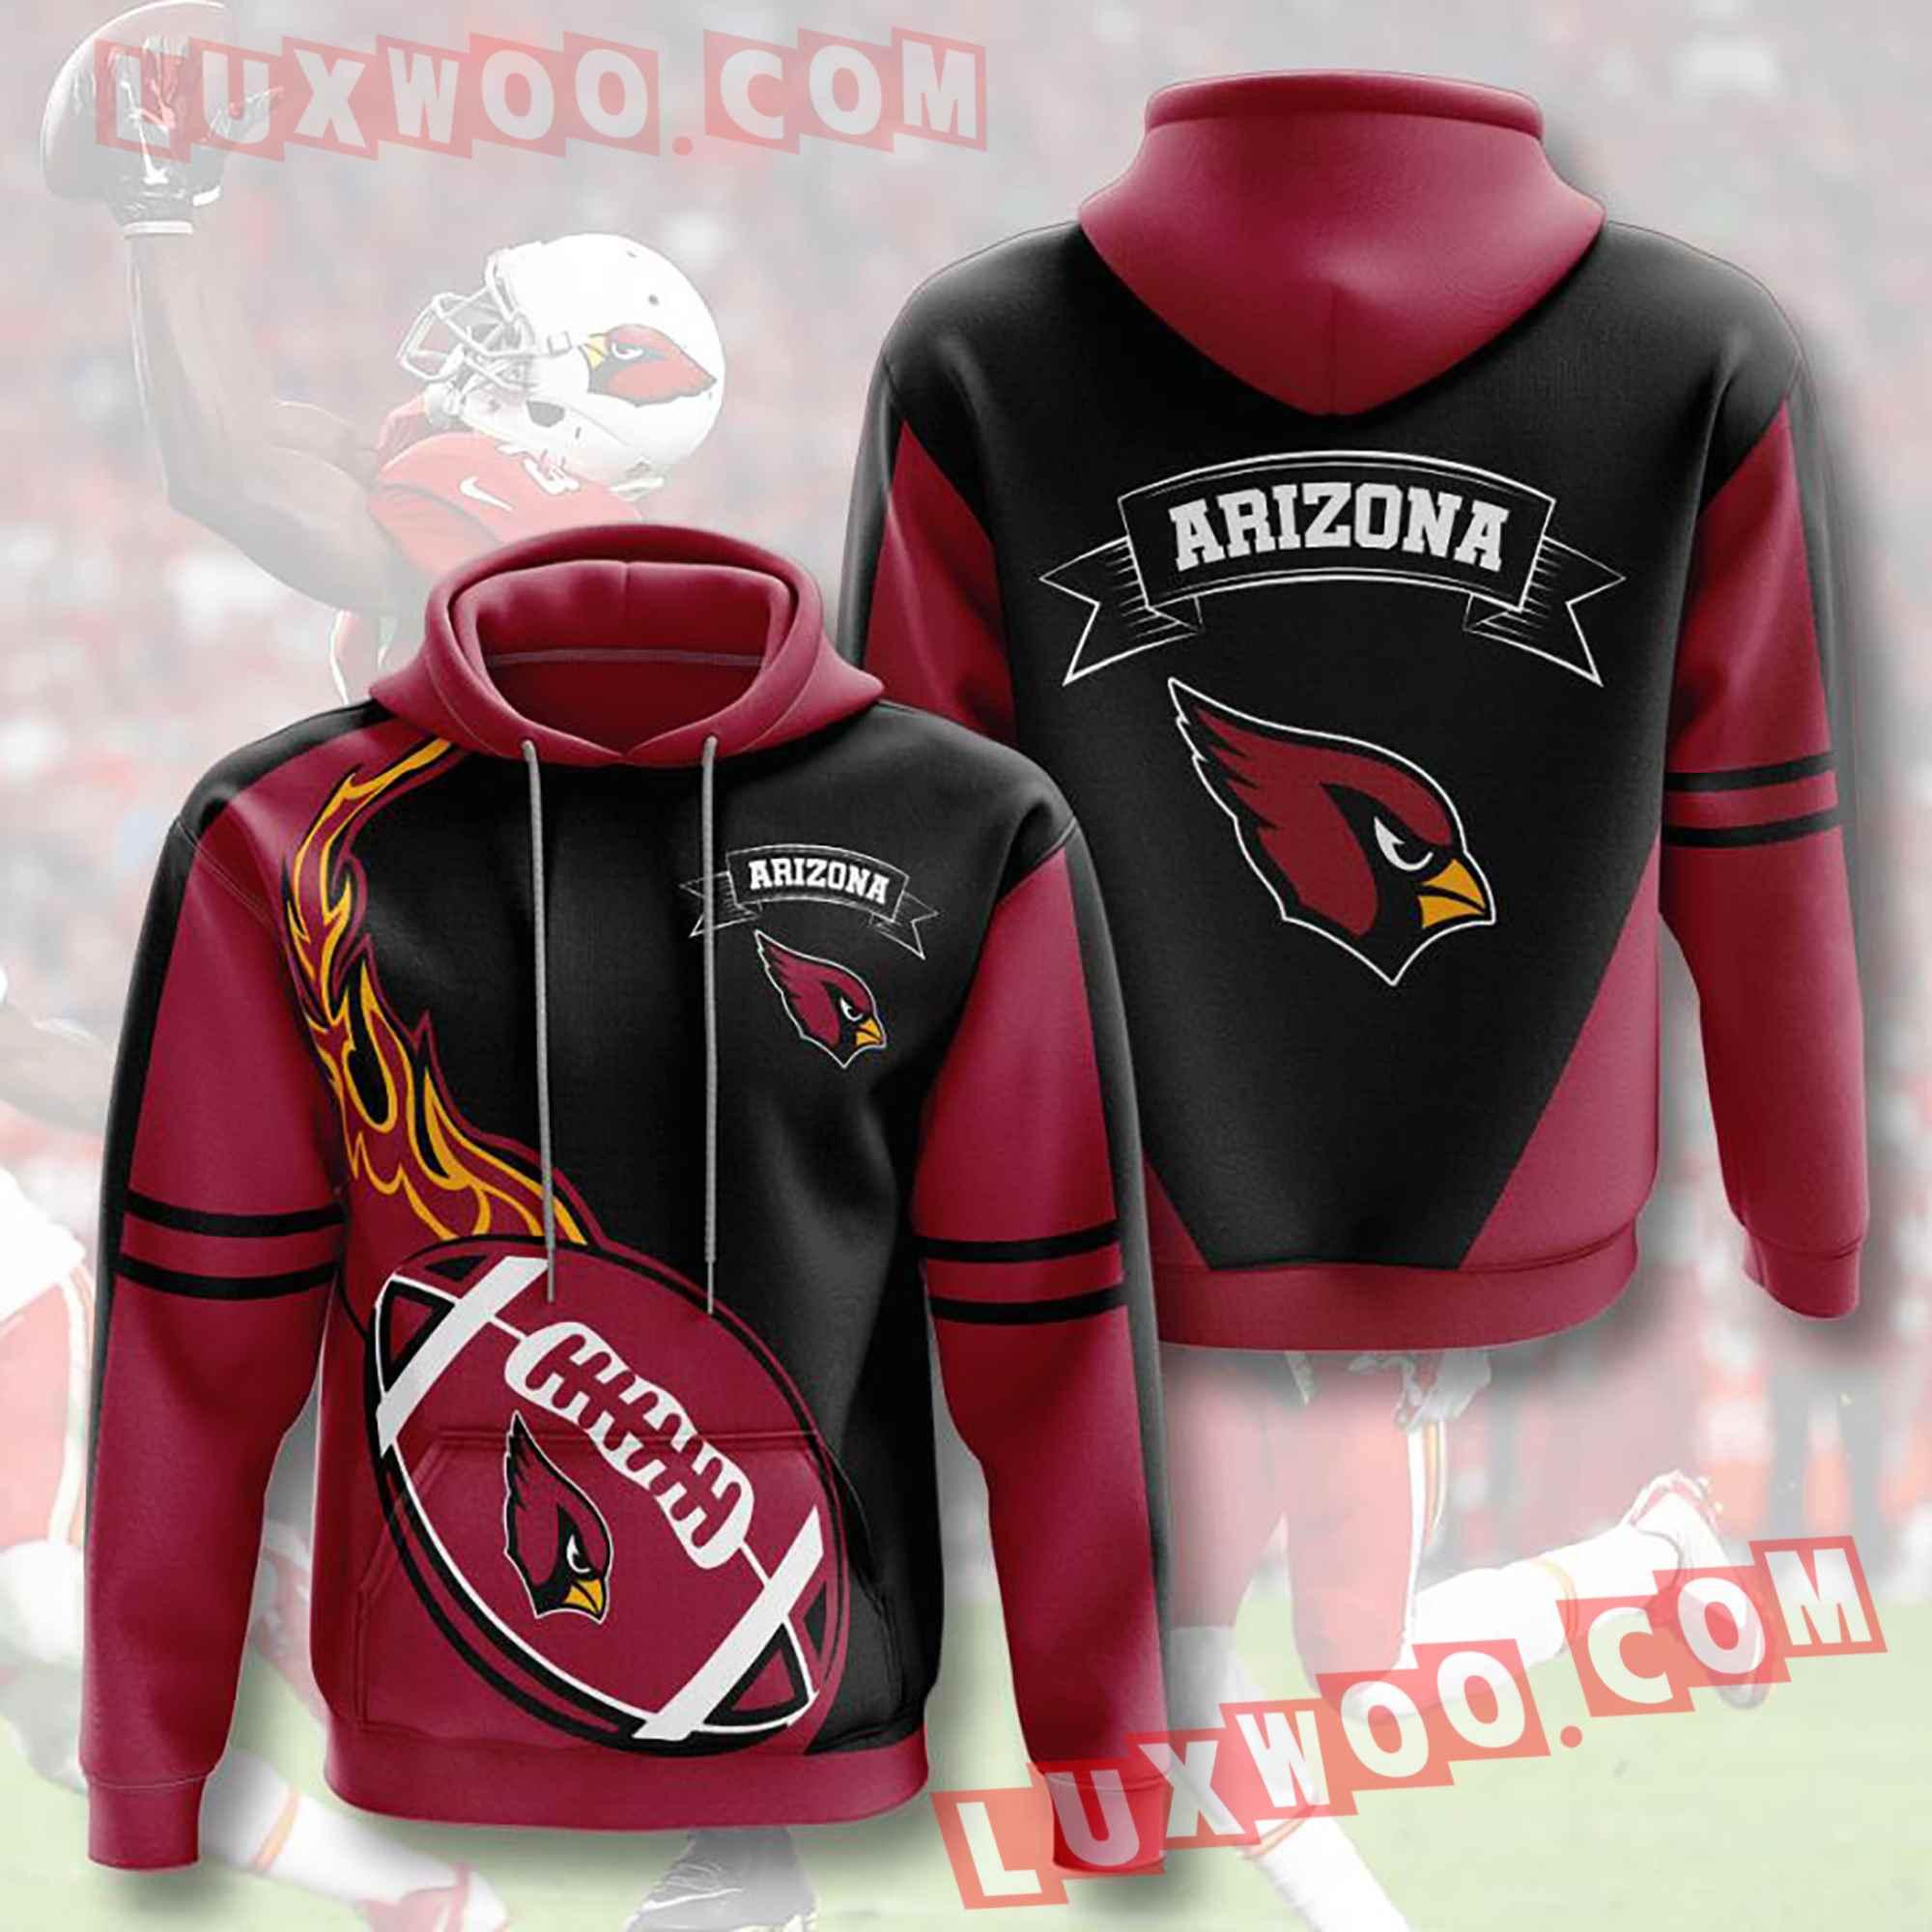 Nfl Arizona Cardinals Hoodies Custom All Over Print 3d Pullover Hoodie V3